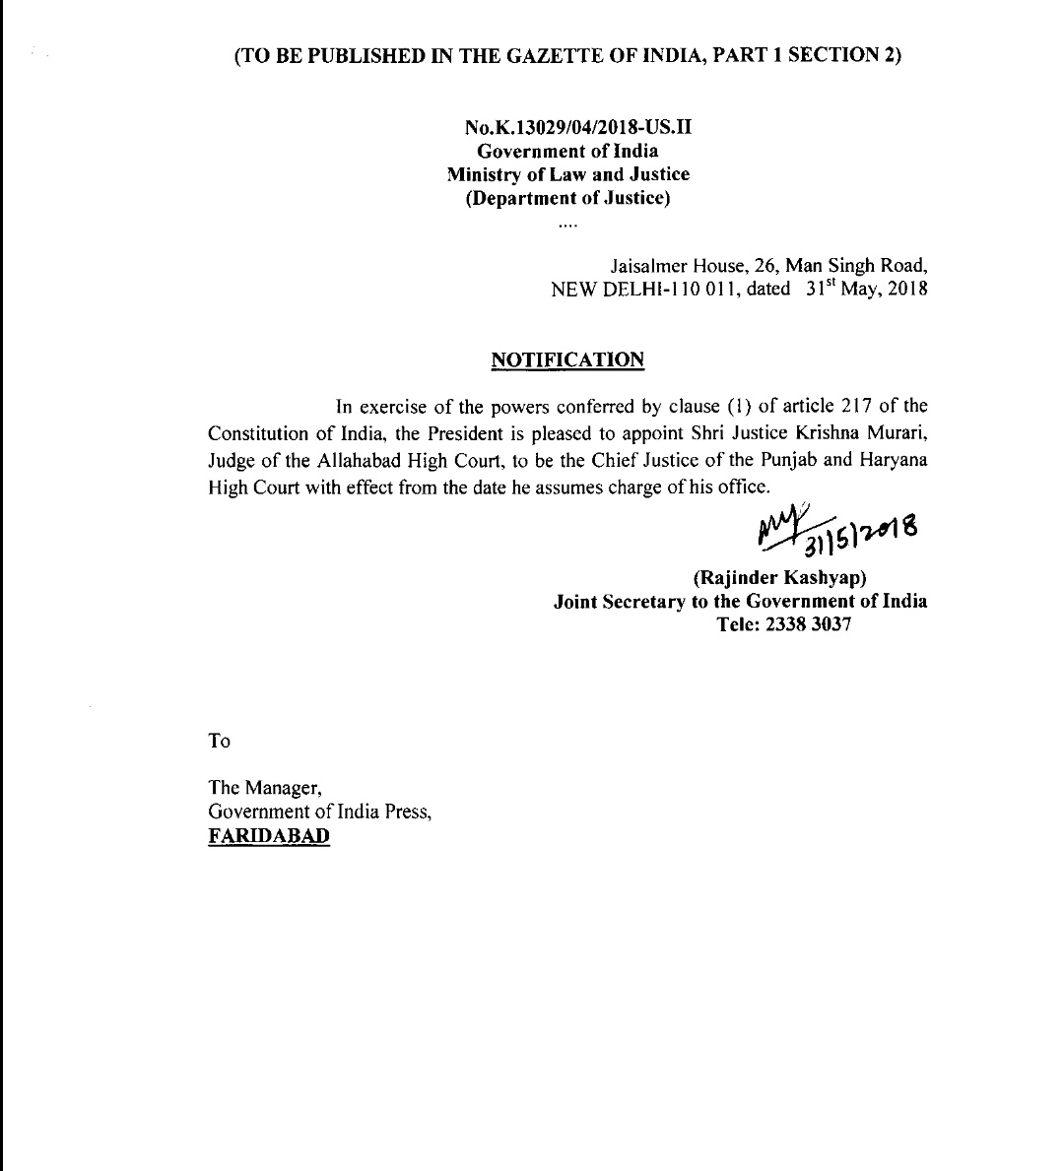 New CJ for Punjab and Haryana HC